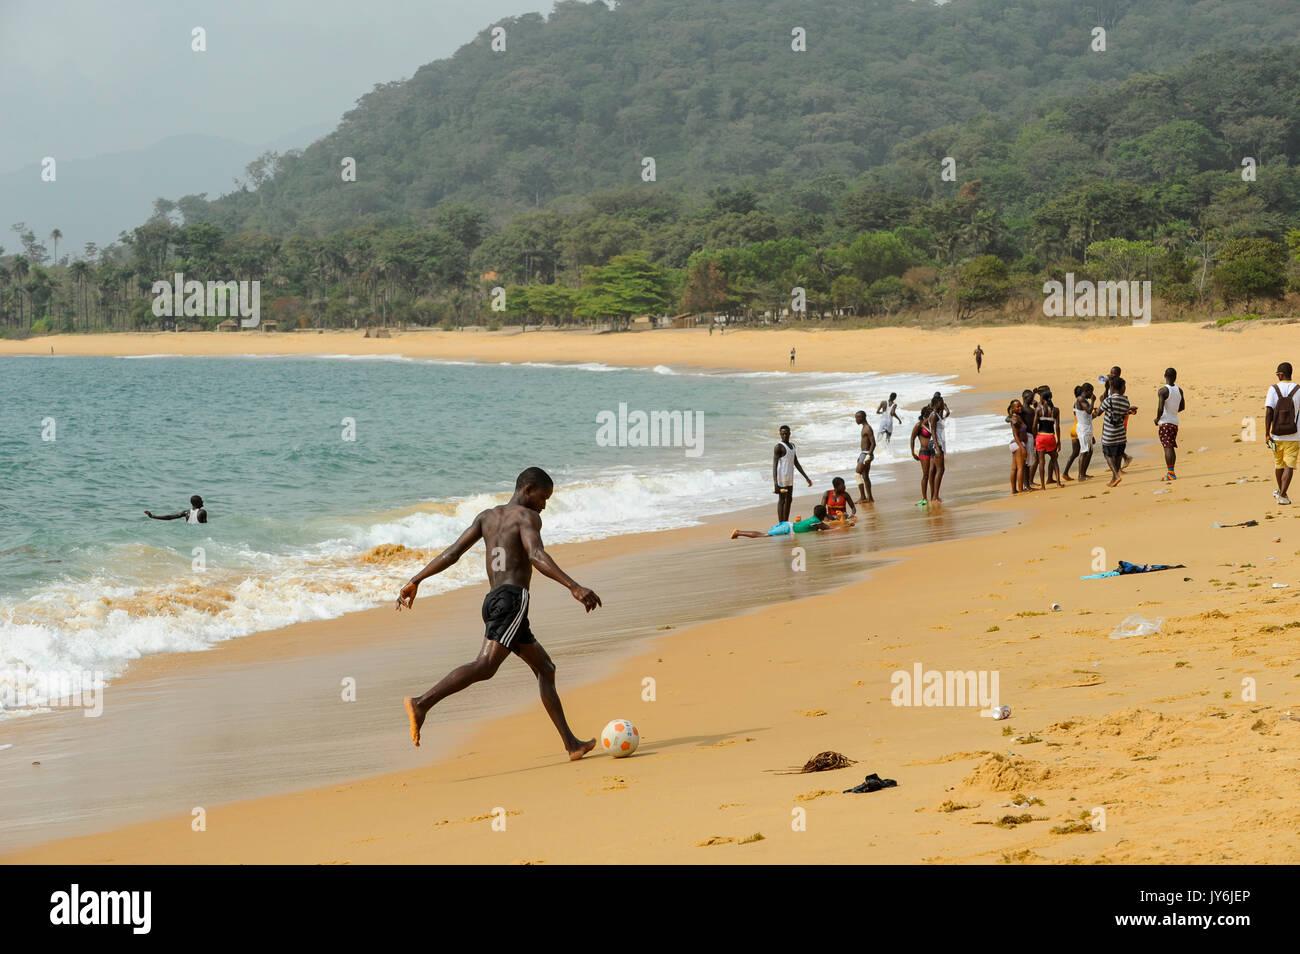 SIERRA LEONE Kent, beach at atlantic ocean / SIERRA LEONE Kent, Strand am atlantischen Ozean - Stock Image